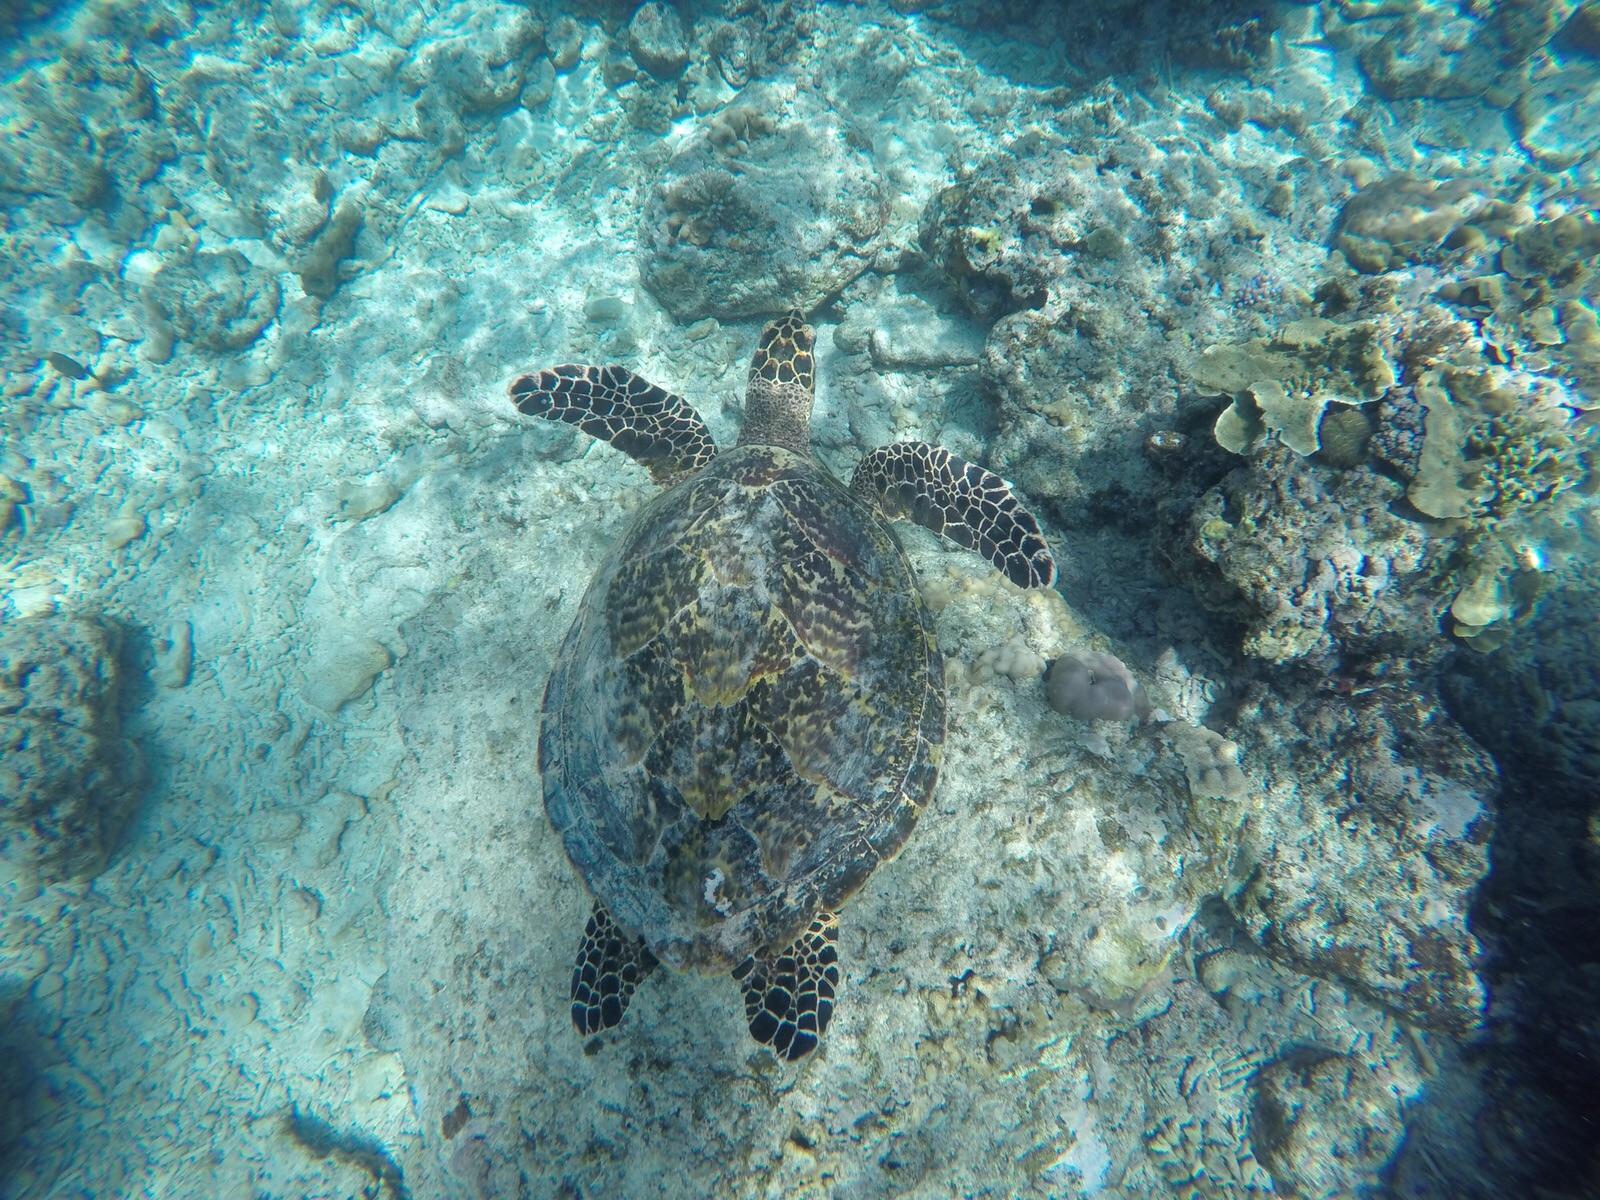 Tartaruga immersione